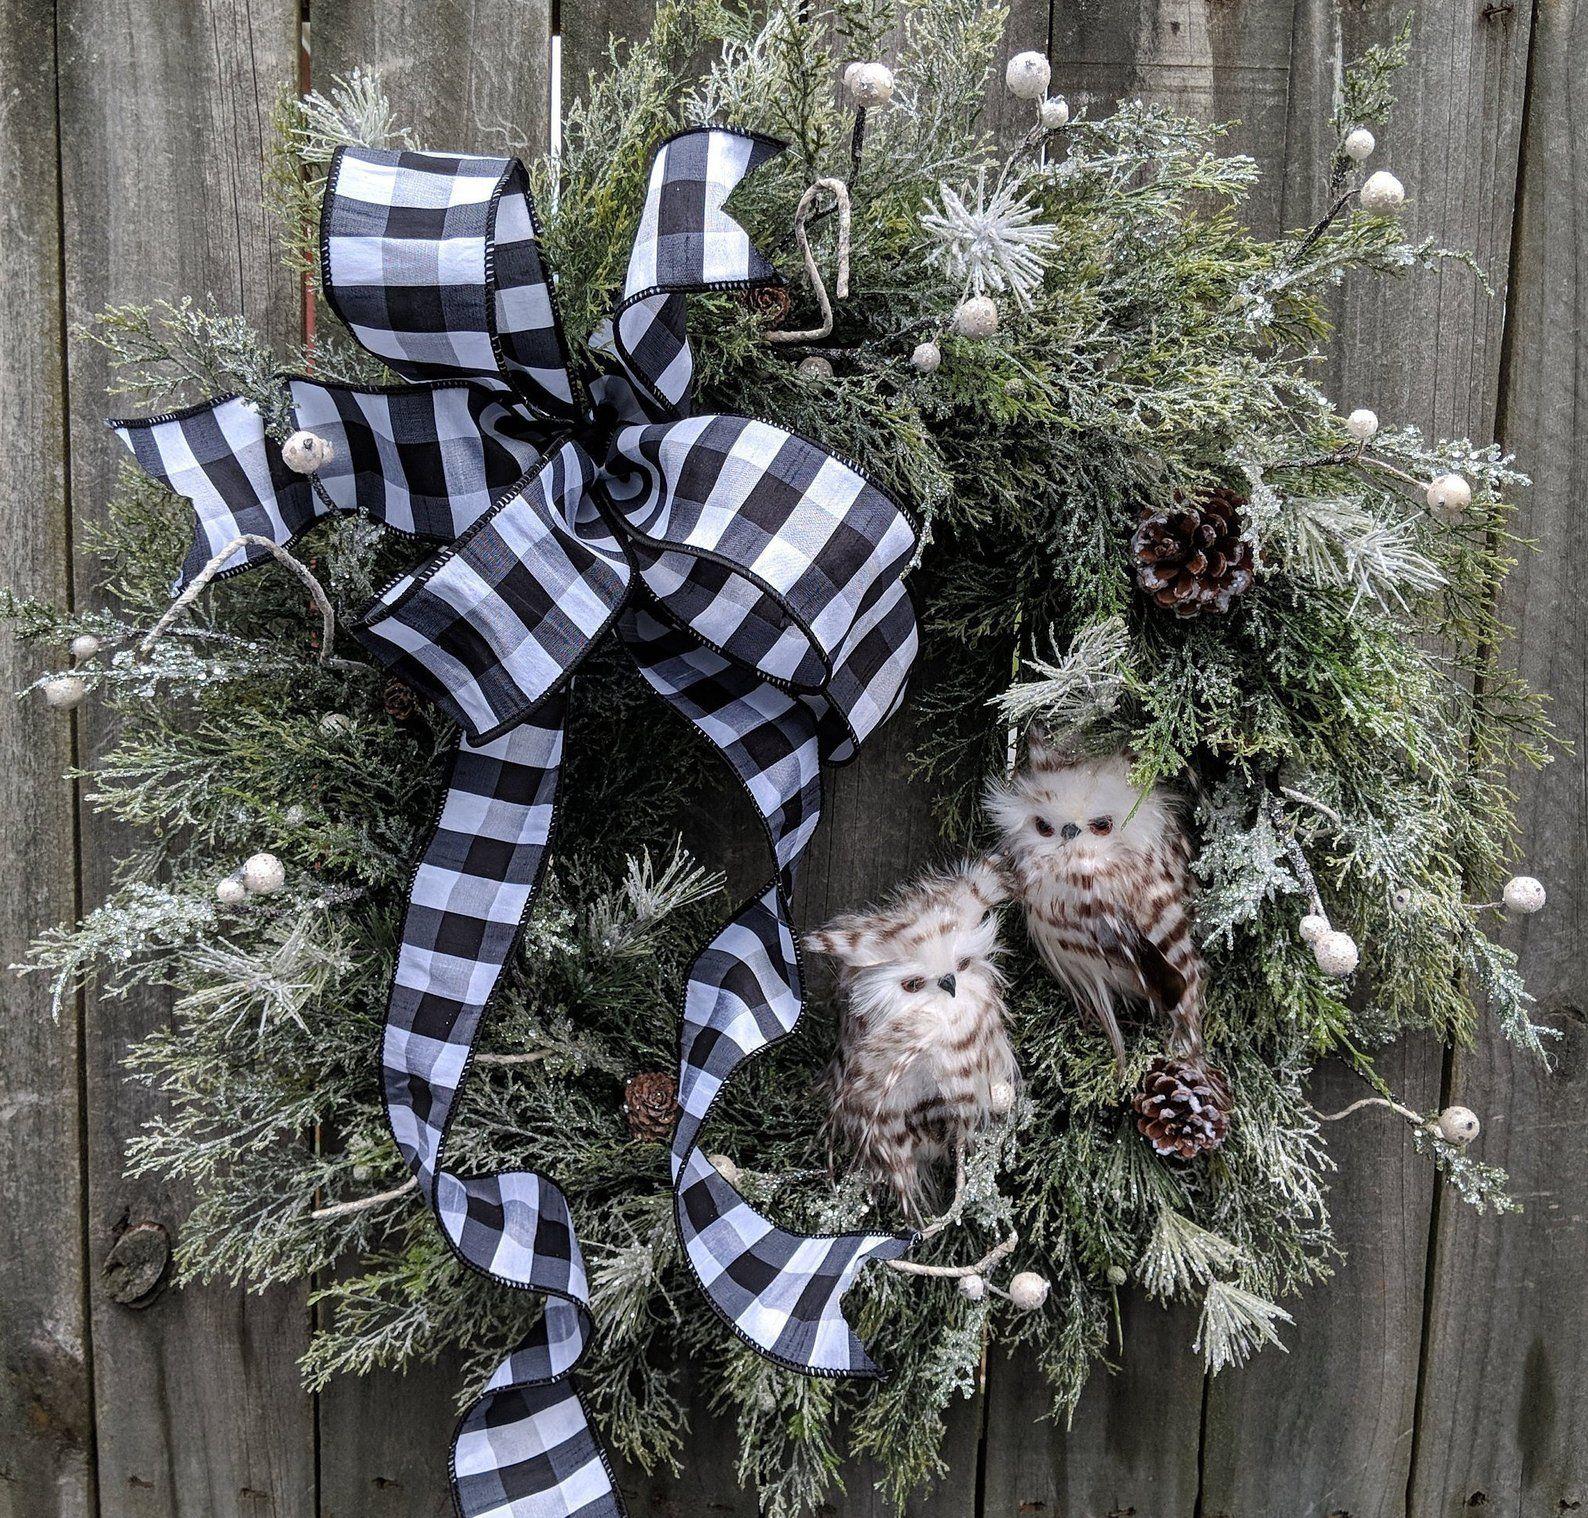 Christmas Wreath Owl Wreath Winter Wreath Black And White Owl Wreath Black And White Christmas Icy Wreath Owl Wreaths Christmas Wreaths Christmas Mesh Wreaths